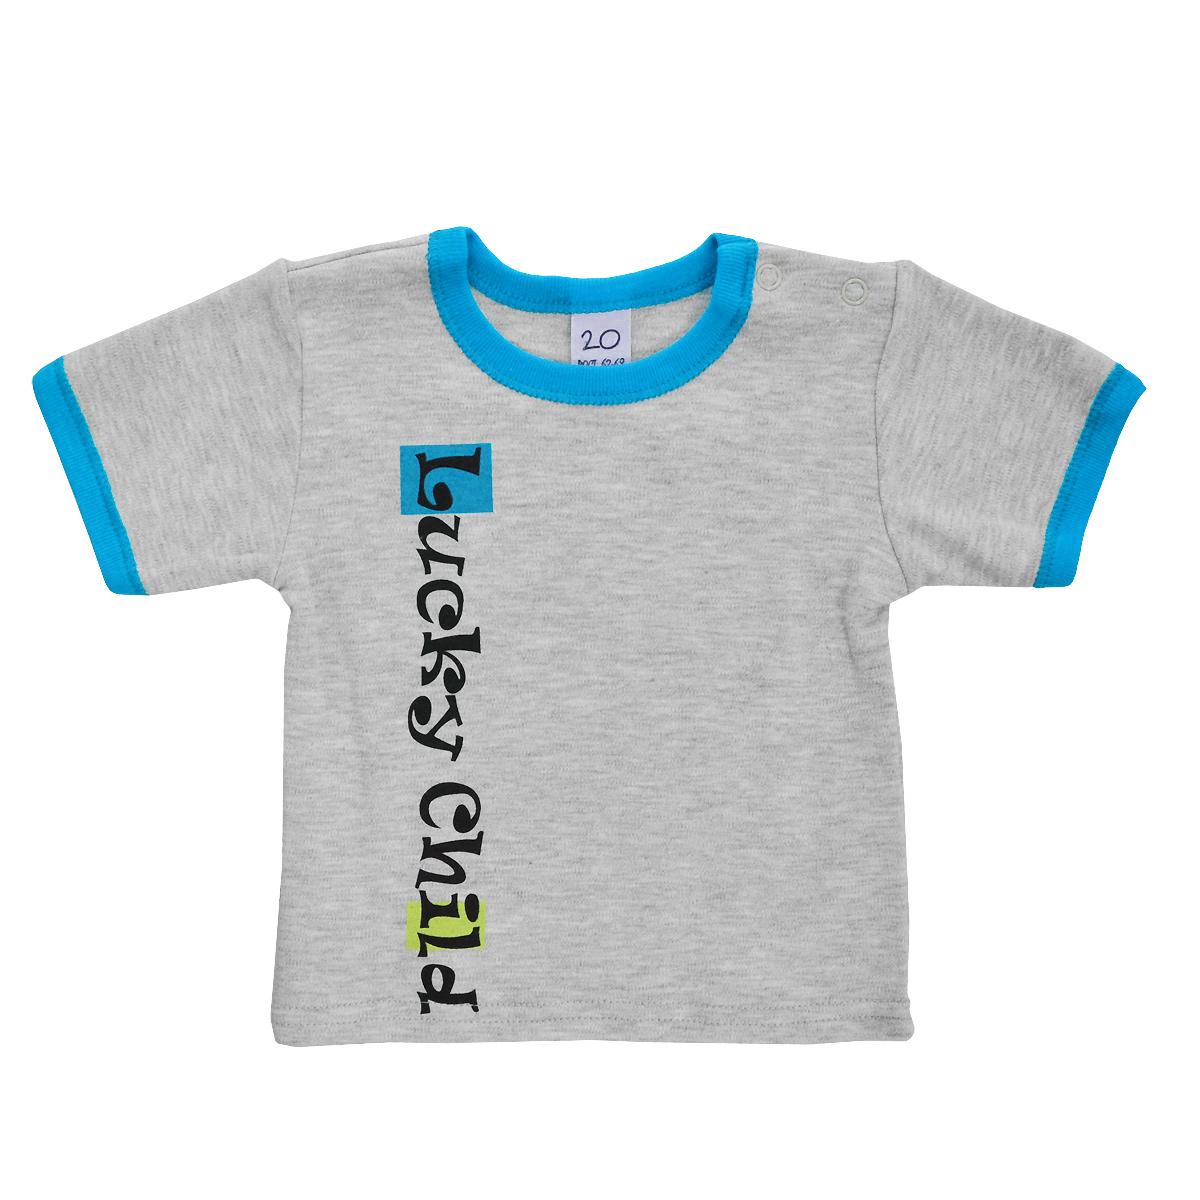 Футболка детская Lucky Child, цвет: серый, голубой. 1-26М. Размер 98/104